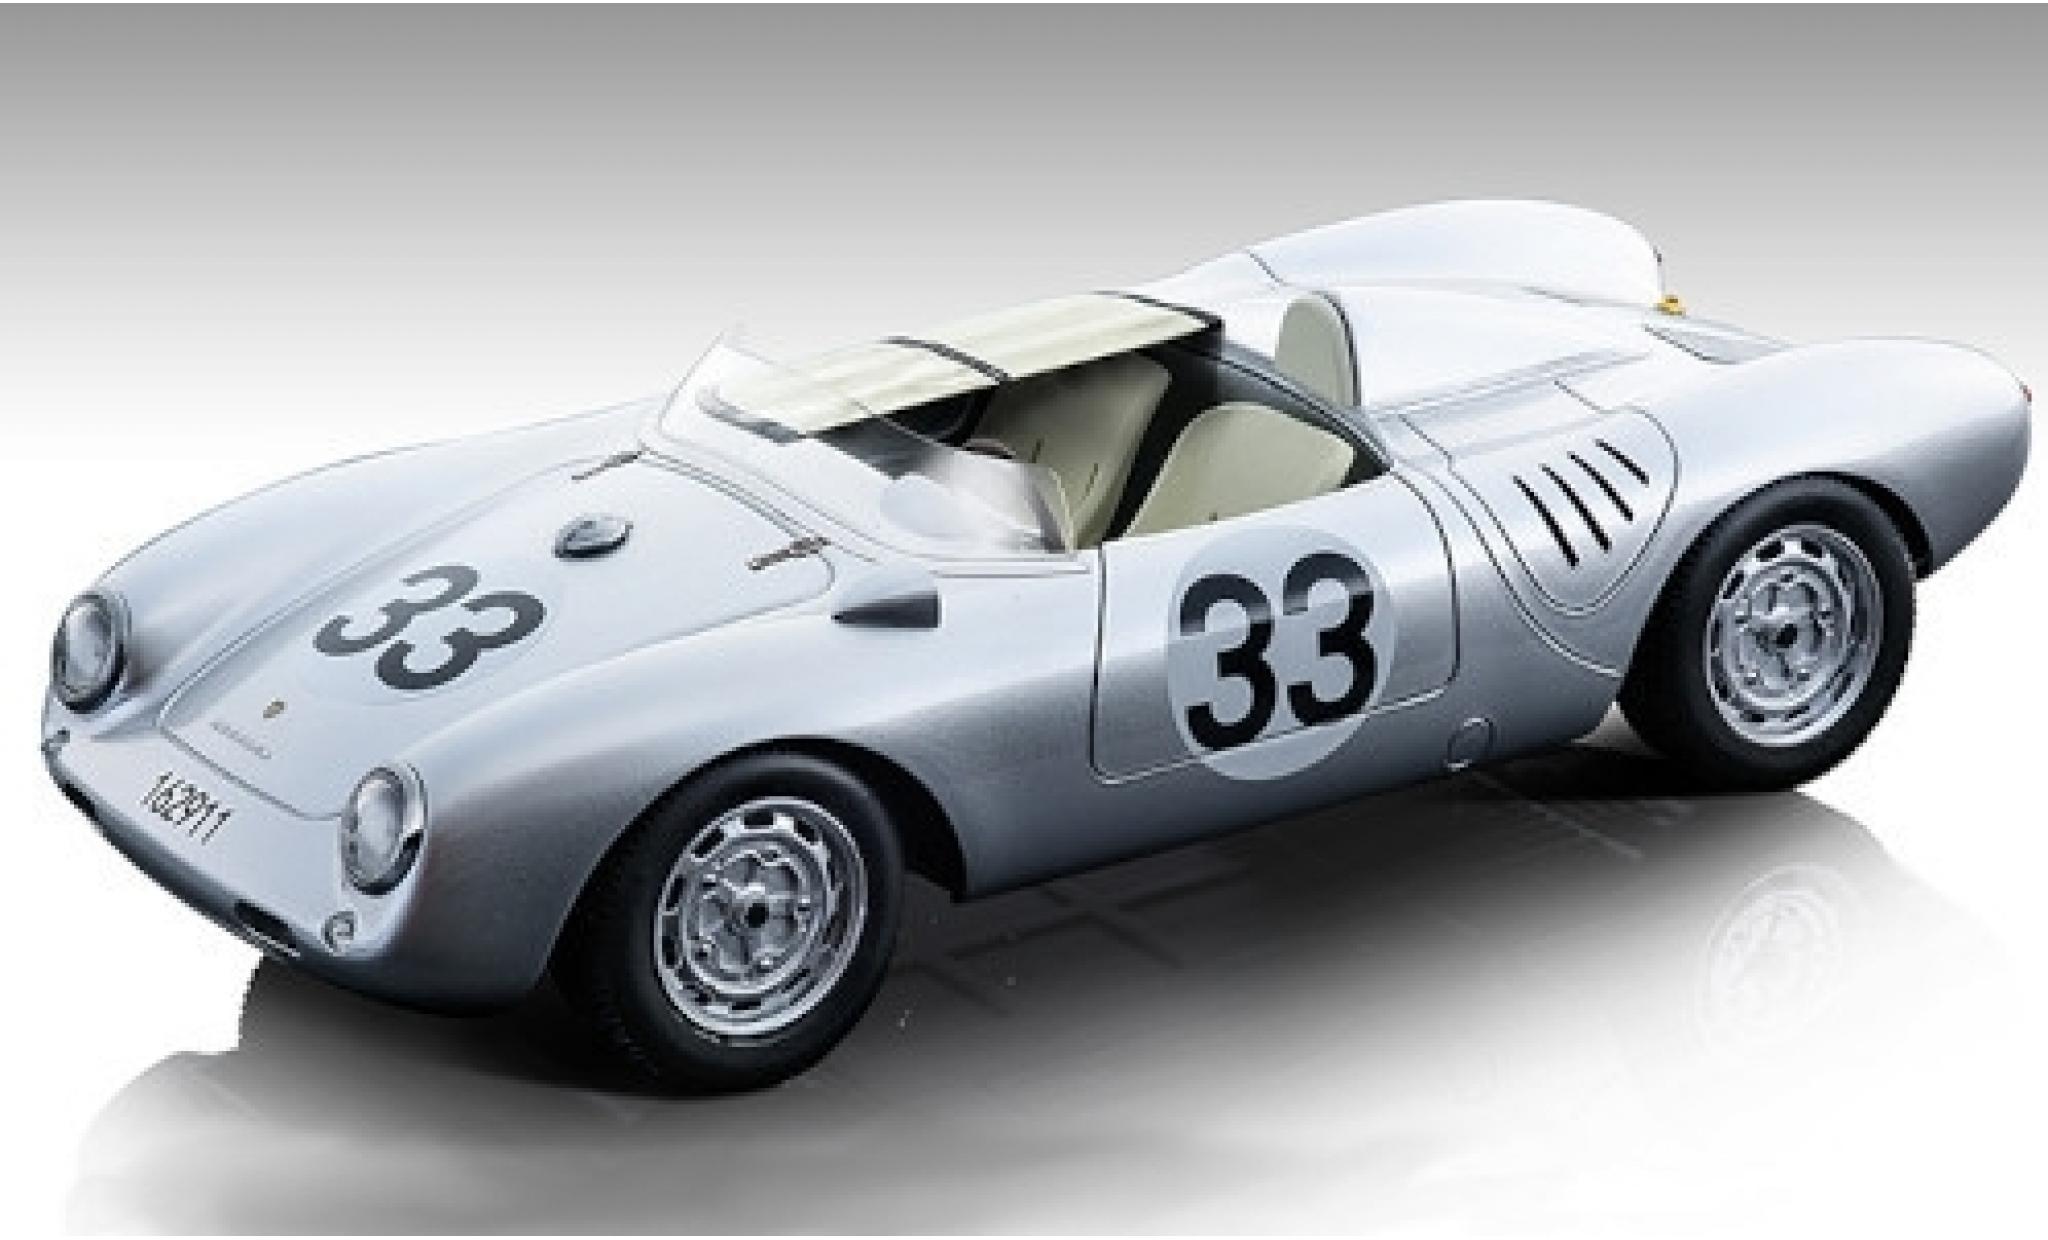 Porsche 550 1/18 Tecnomodel A RS No.33 KG 24h Le Mans 1957 H.Herrmann/R.von Frankenberg